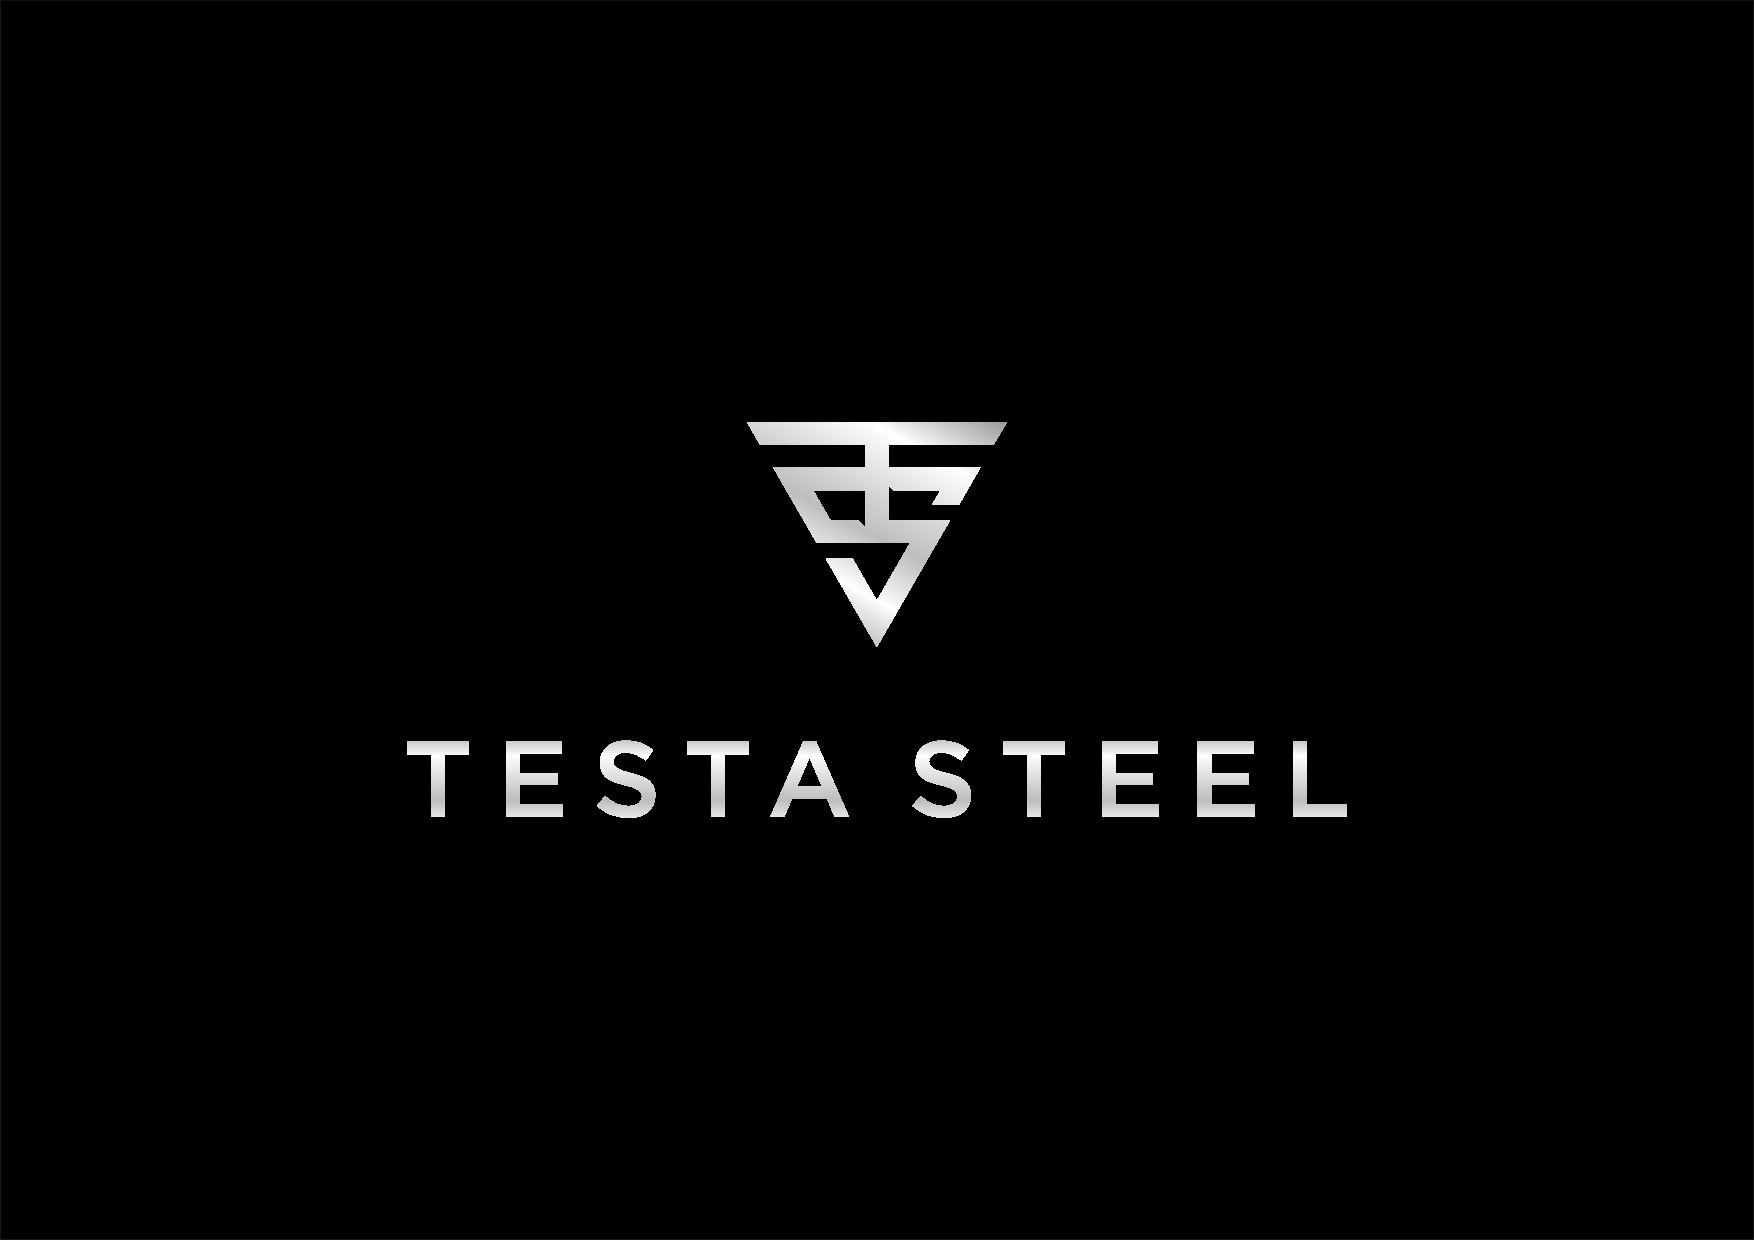 Design a powerful logo for testa steel.